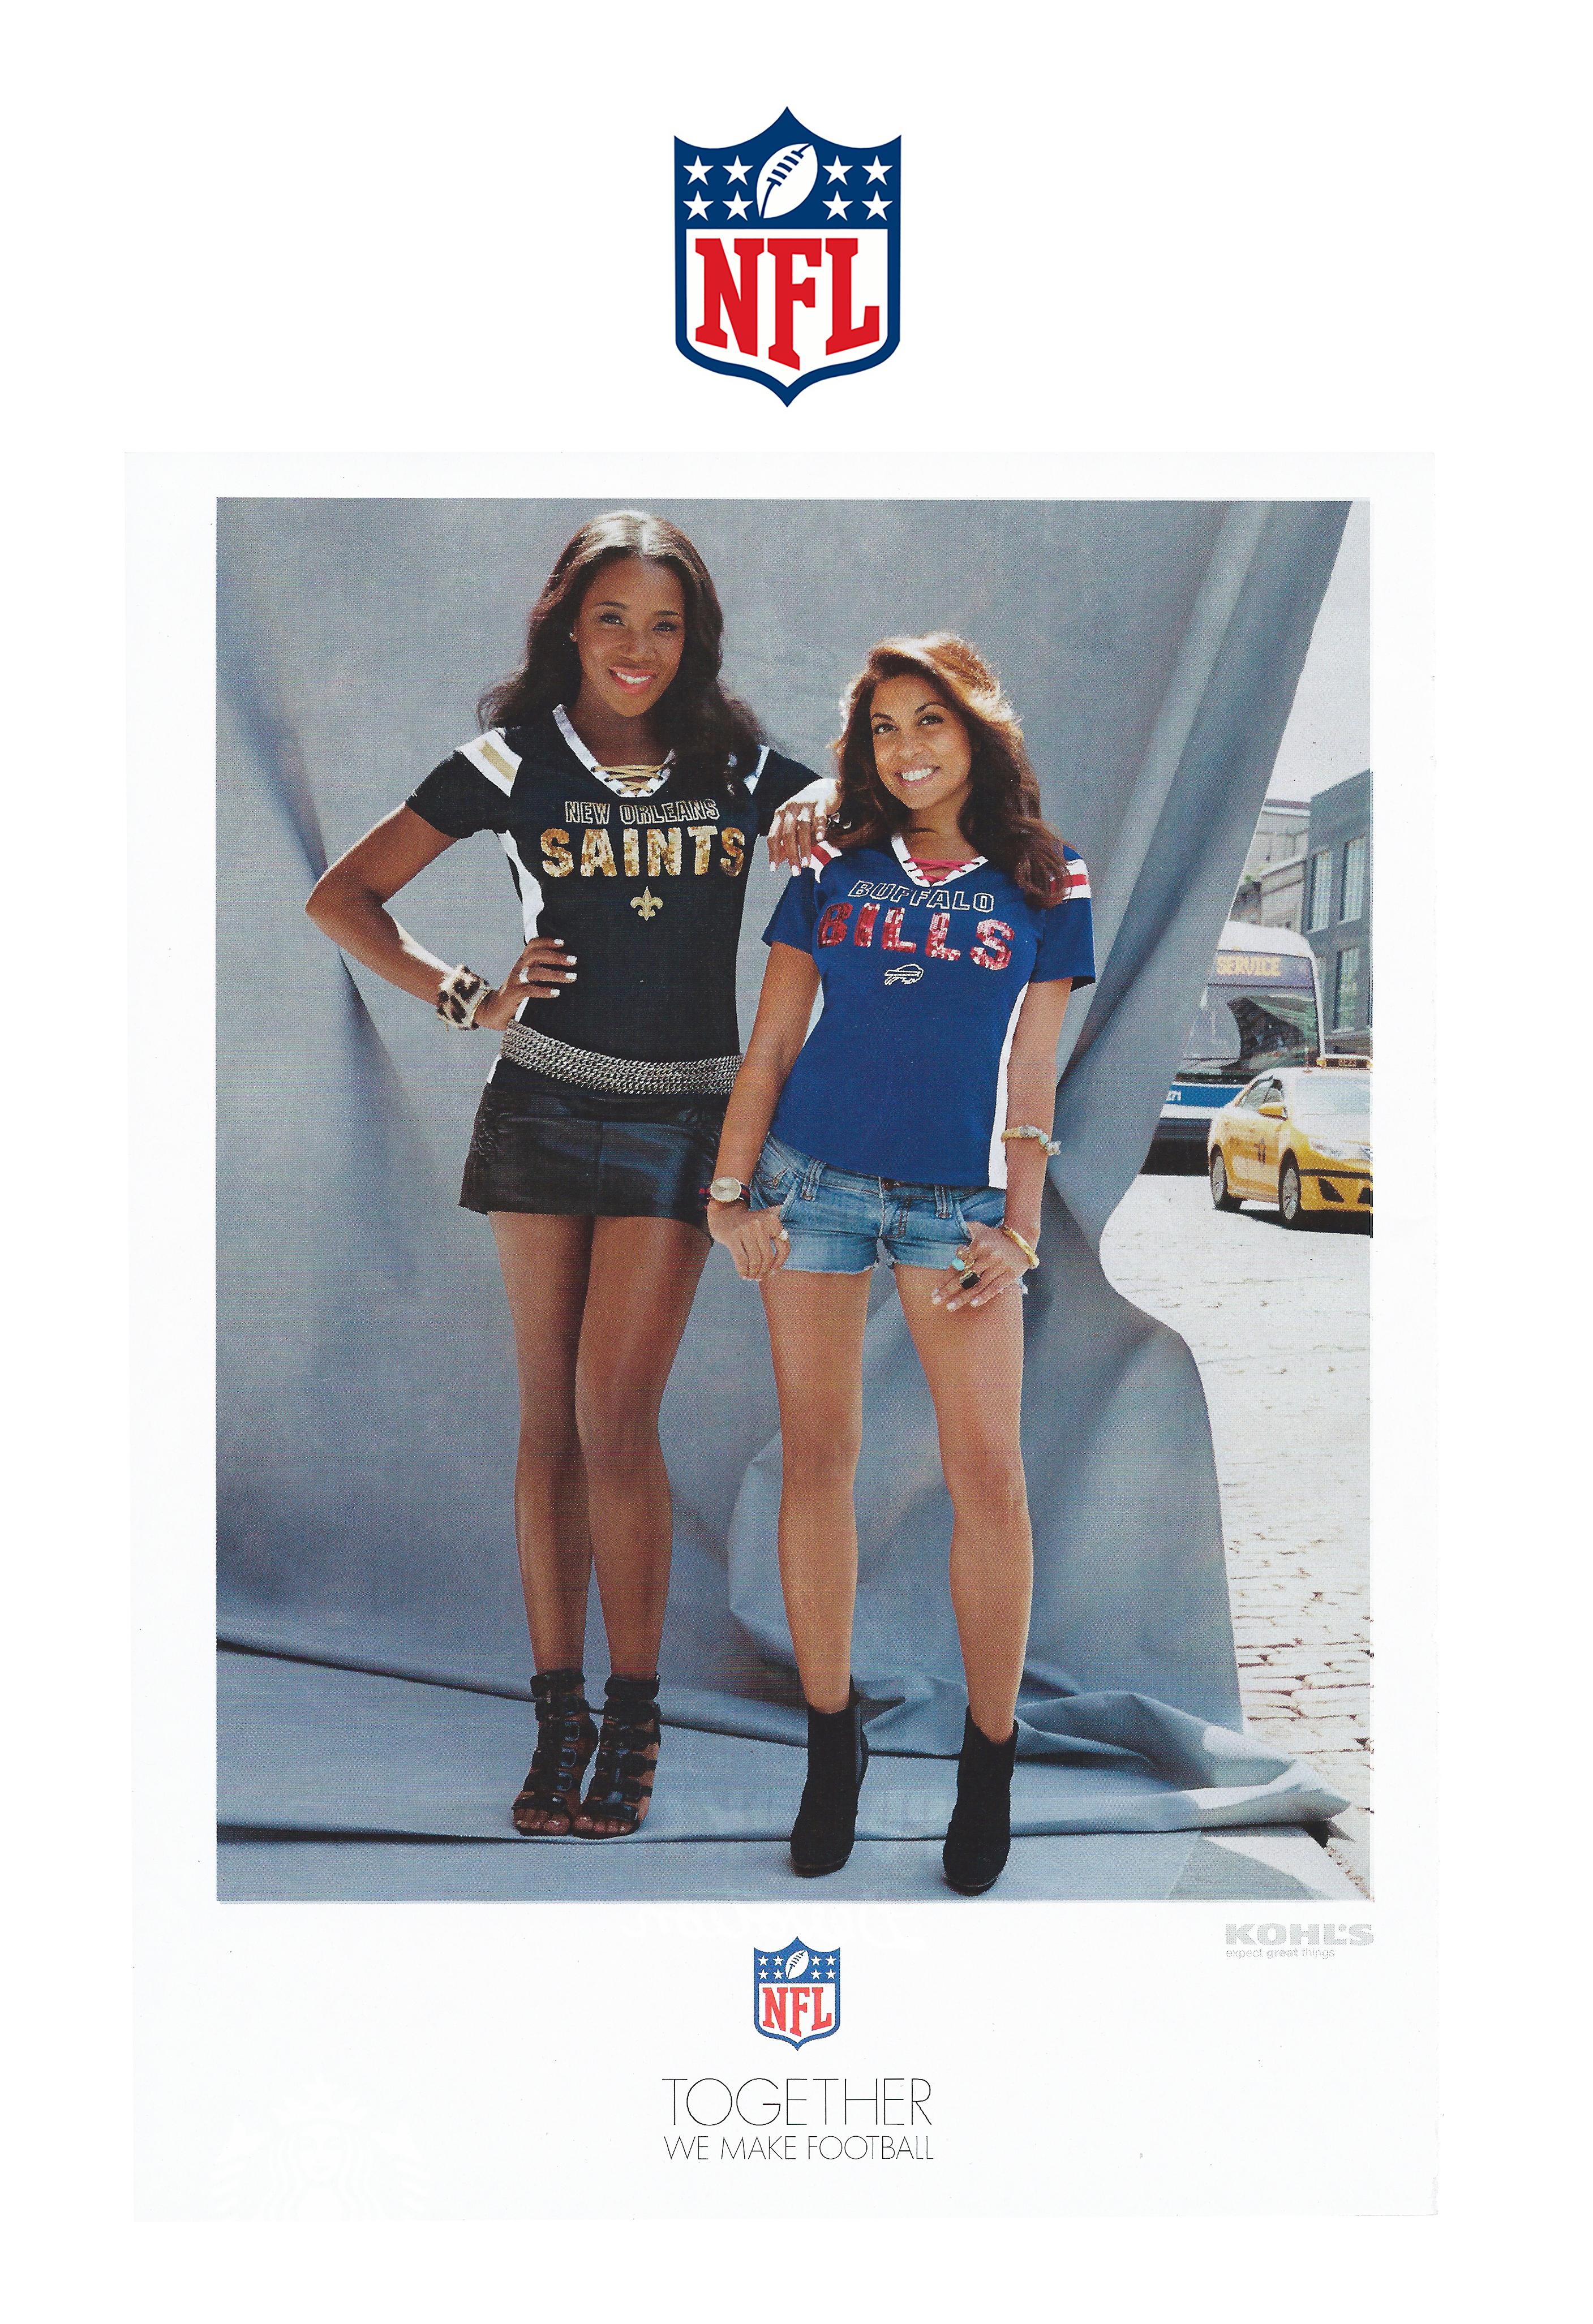 NFL Women's Apparel